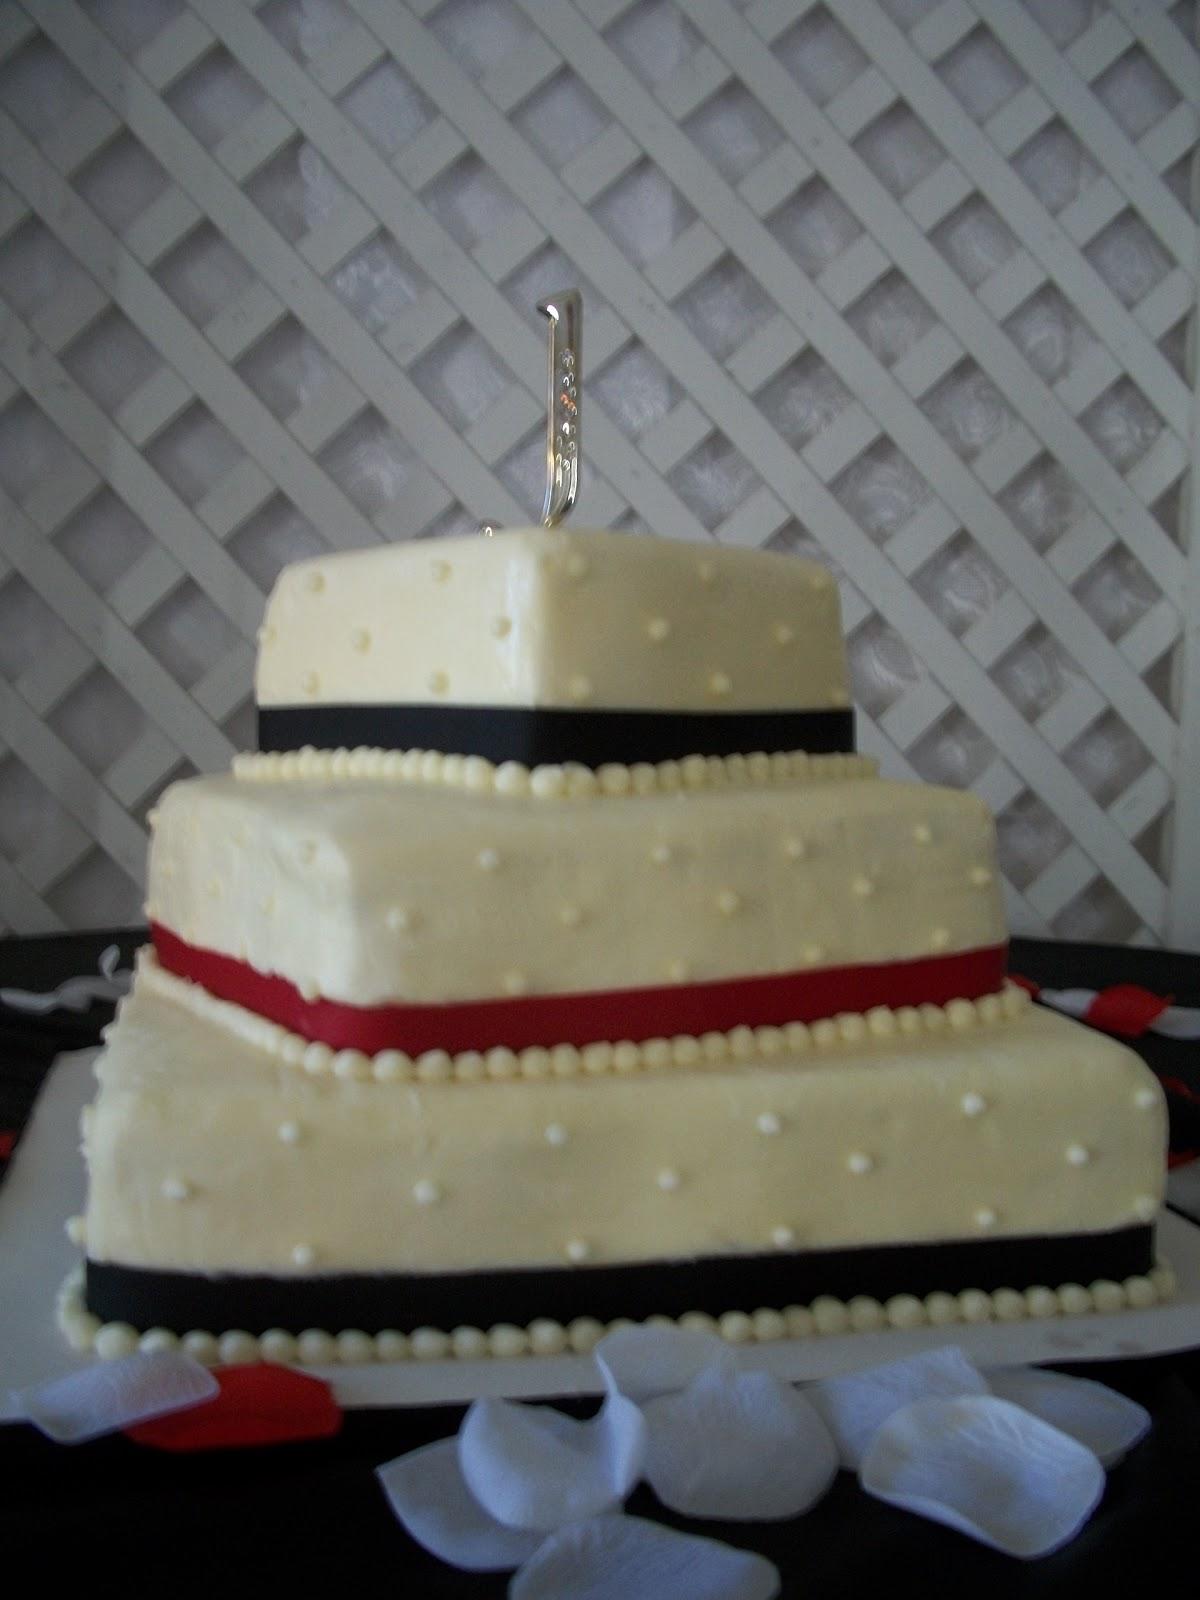 Lauren s Cakes Three Tier fset Square Wedding Cake